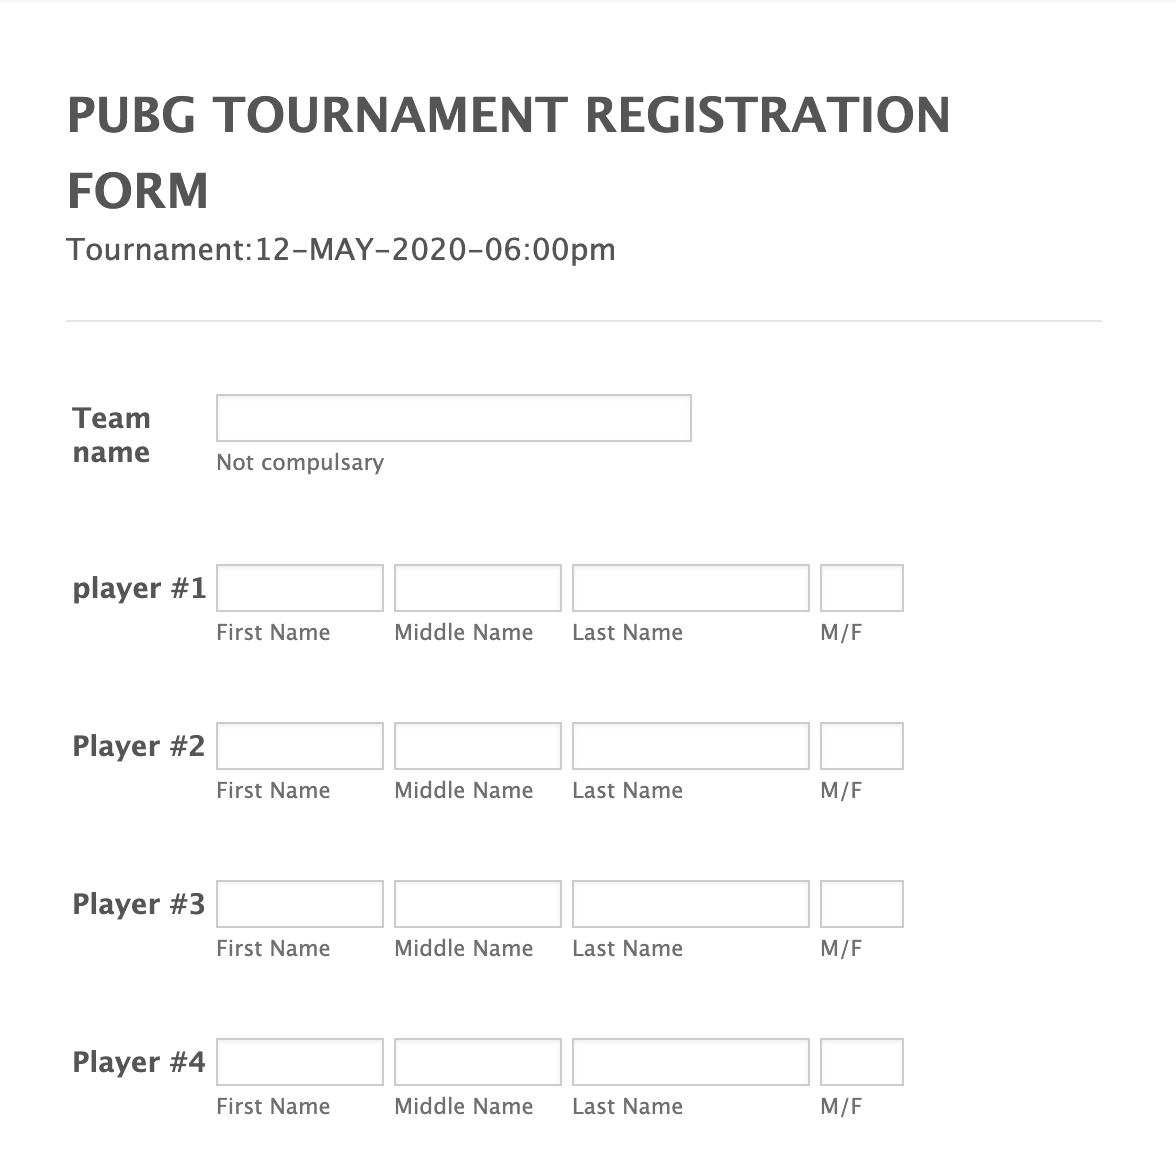 Tournament Registration Form Template